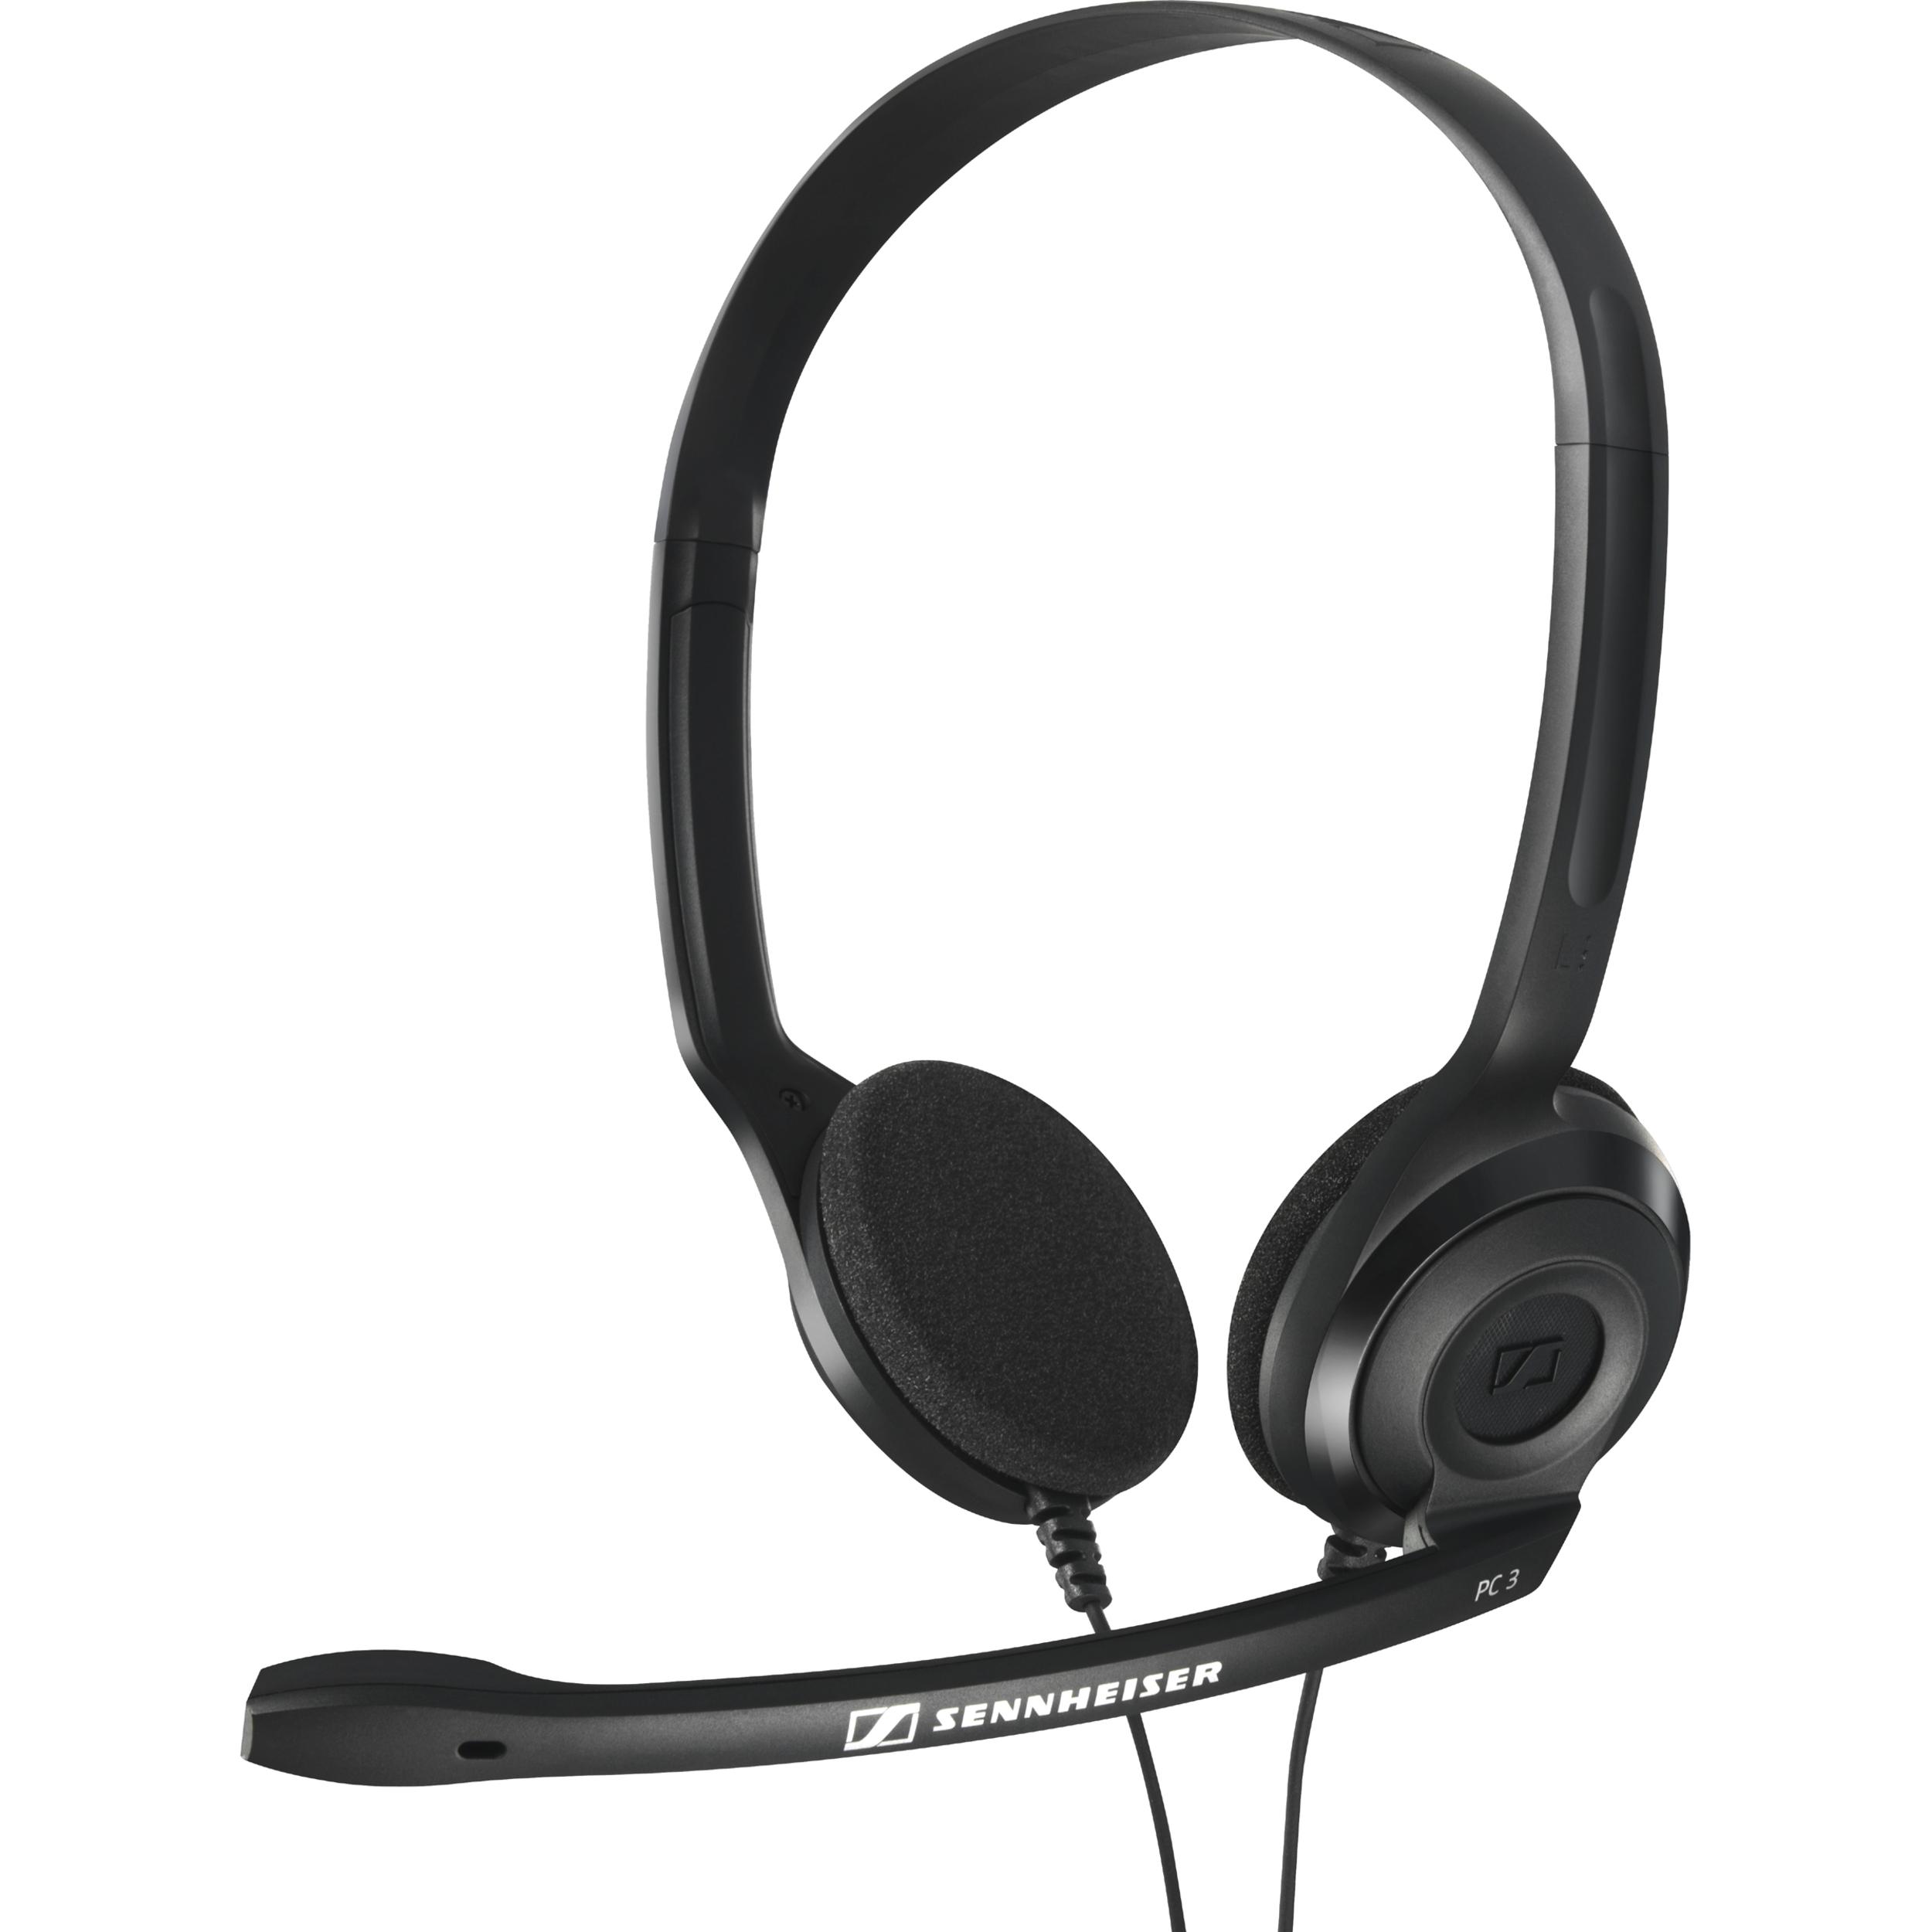 Sennheiser PC 3 CHAT Headset_subImage_1